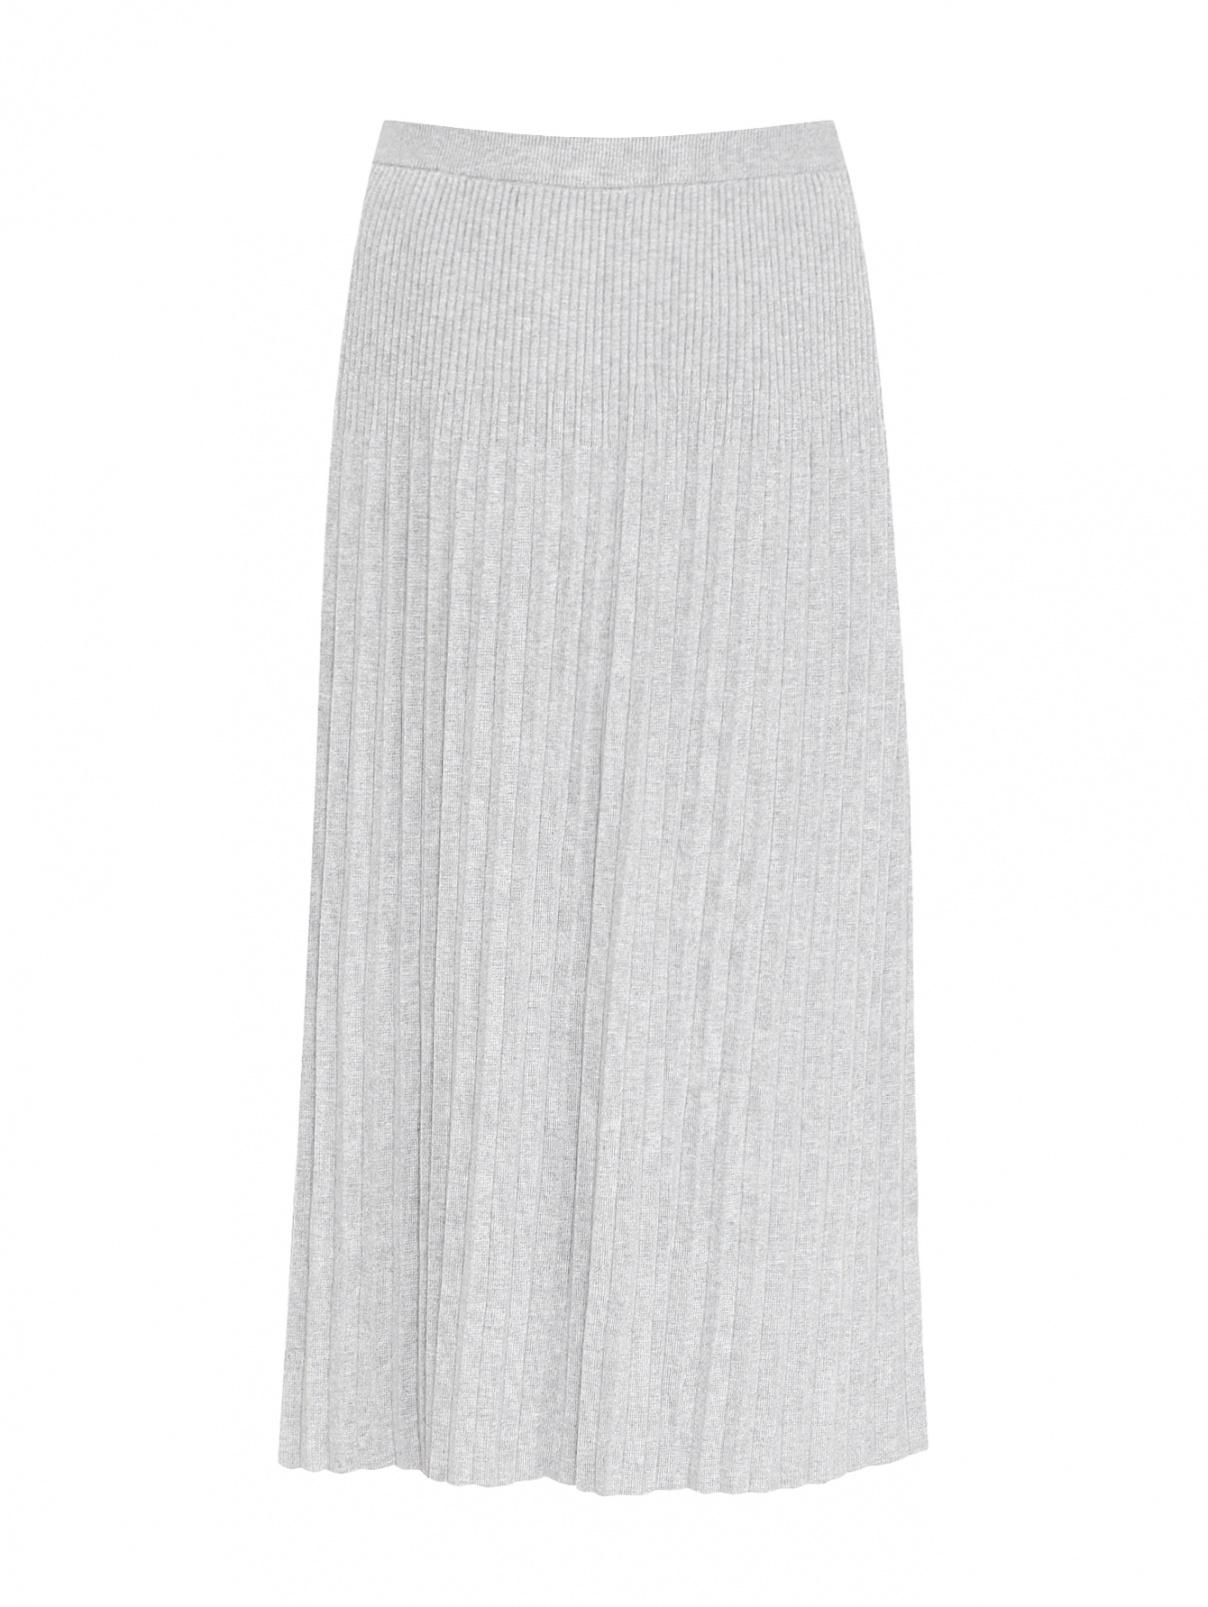 Трикотажная юбка-миди на резинке Michael by Michael Kors  –  Общий вид